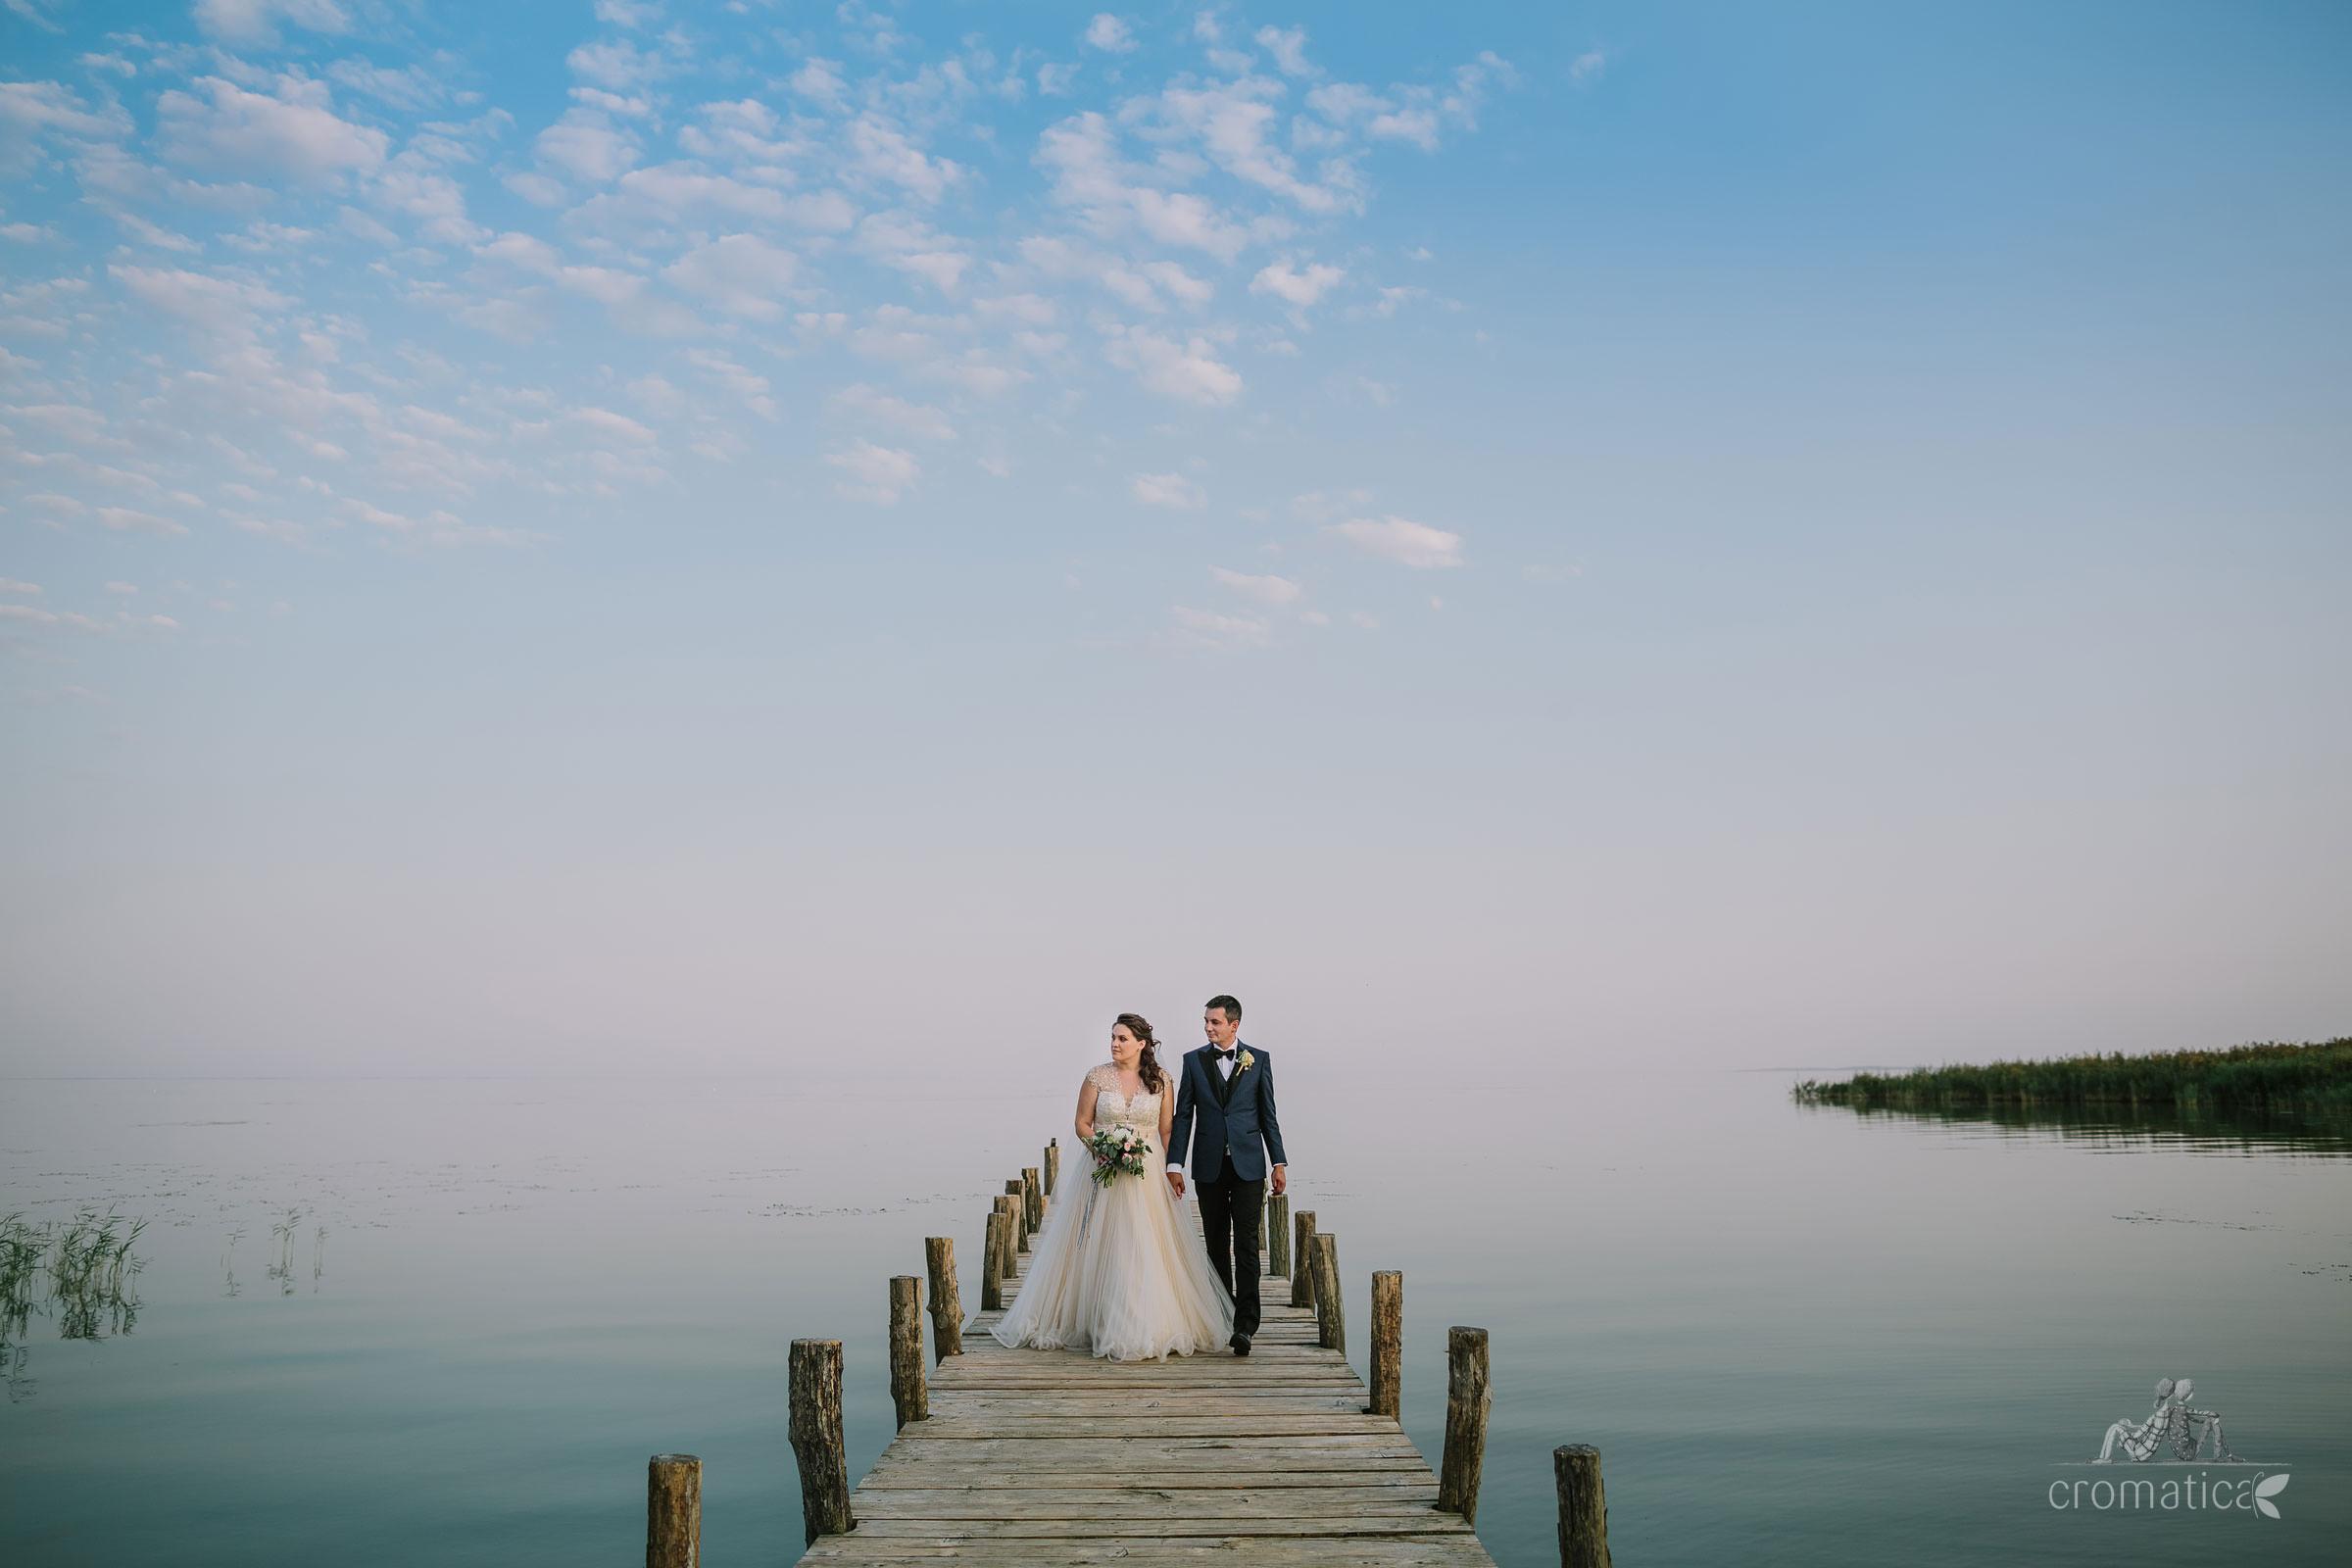 giorgiana constantin fotografii nunta delta royal delta dunarii 052